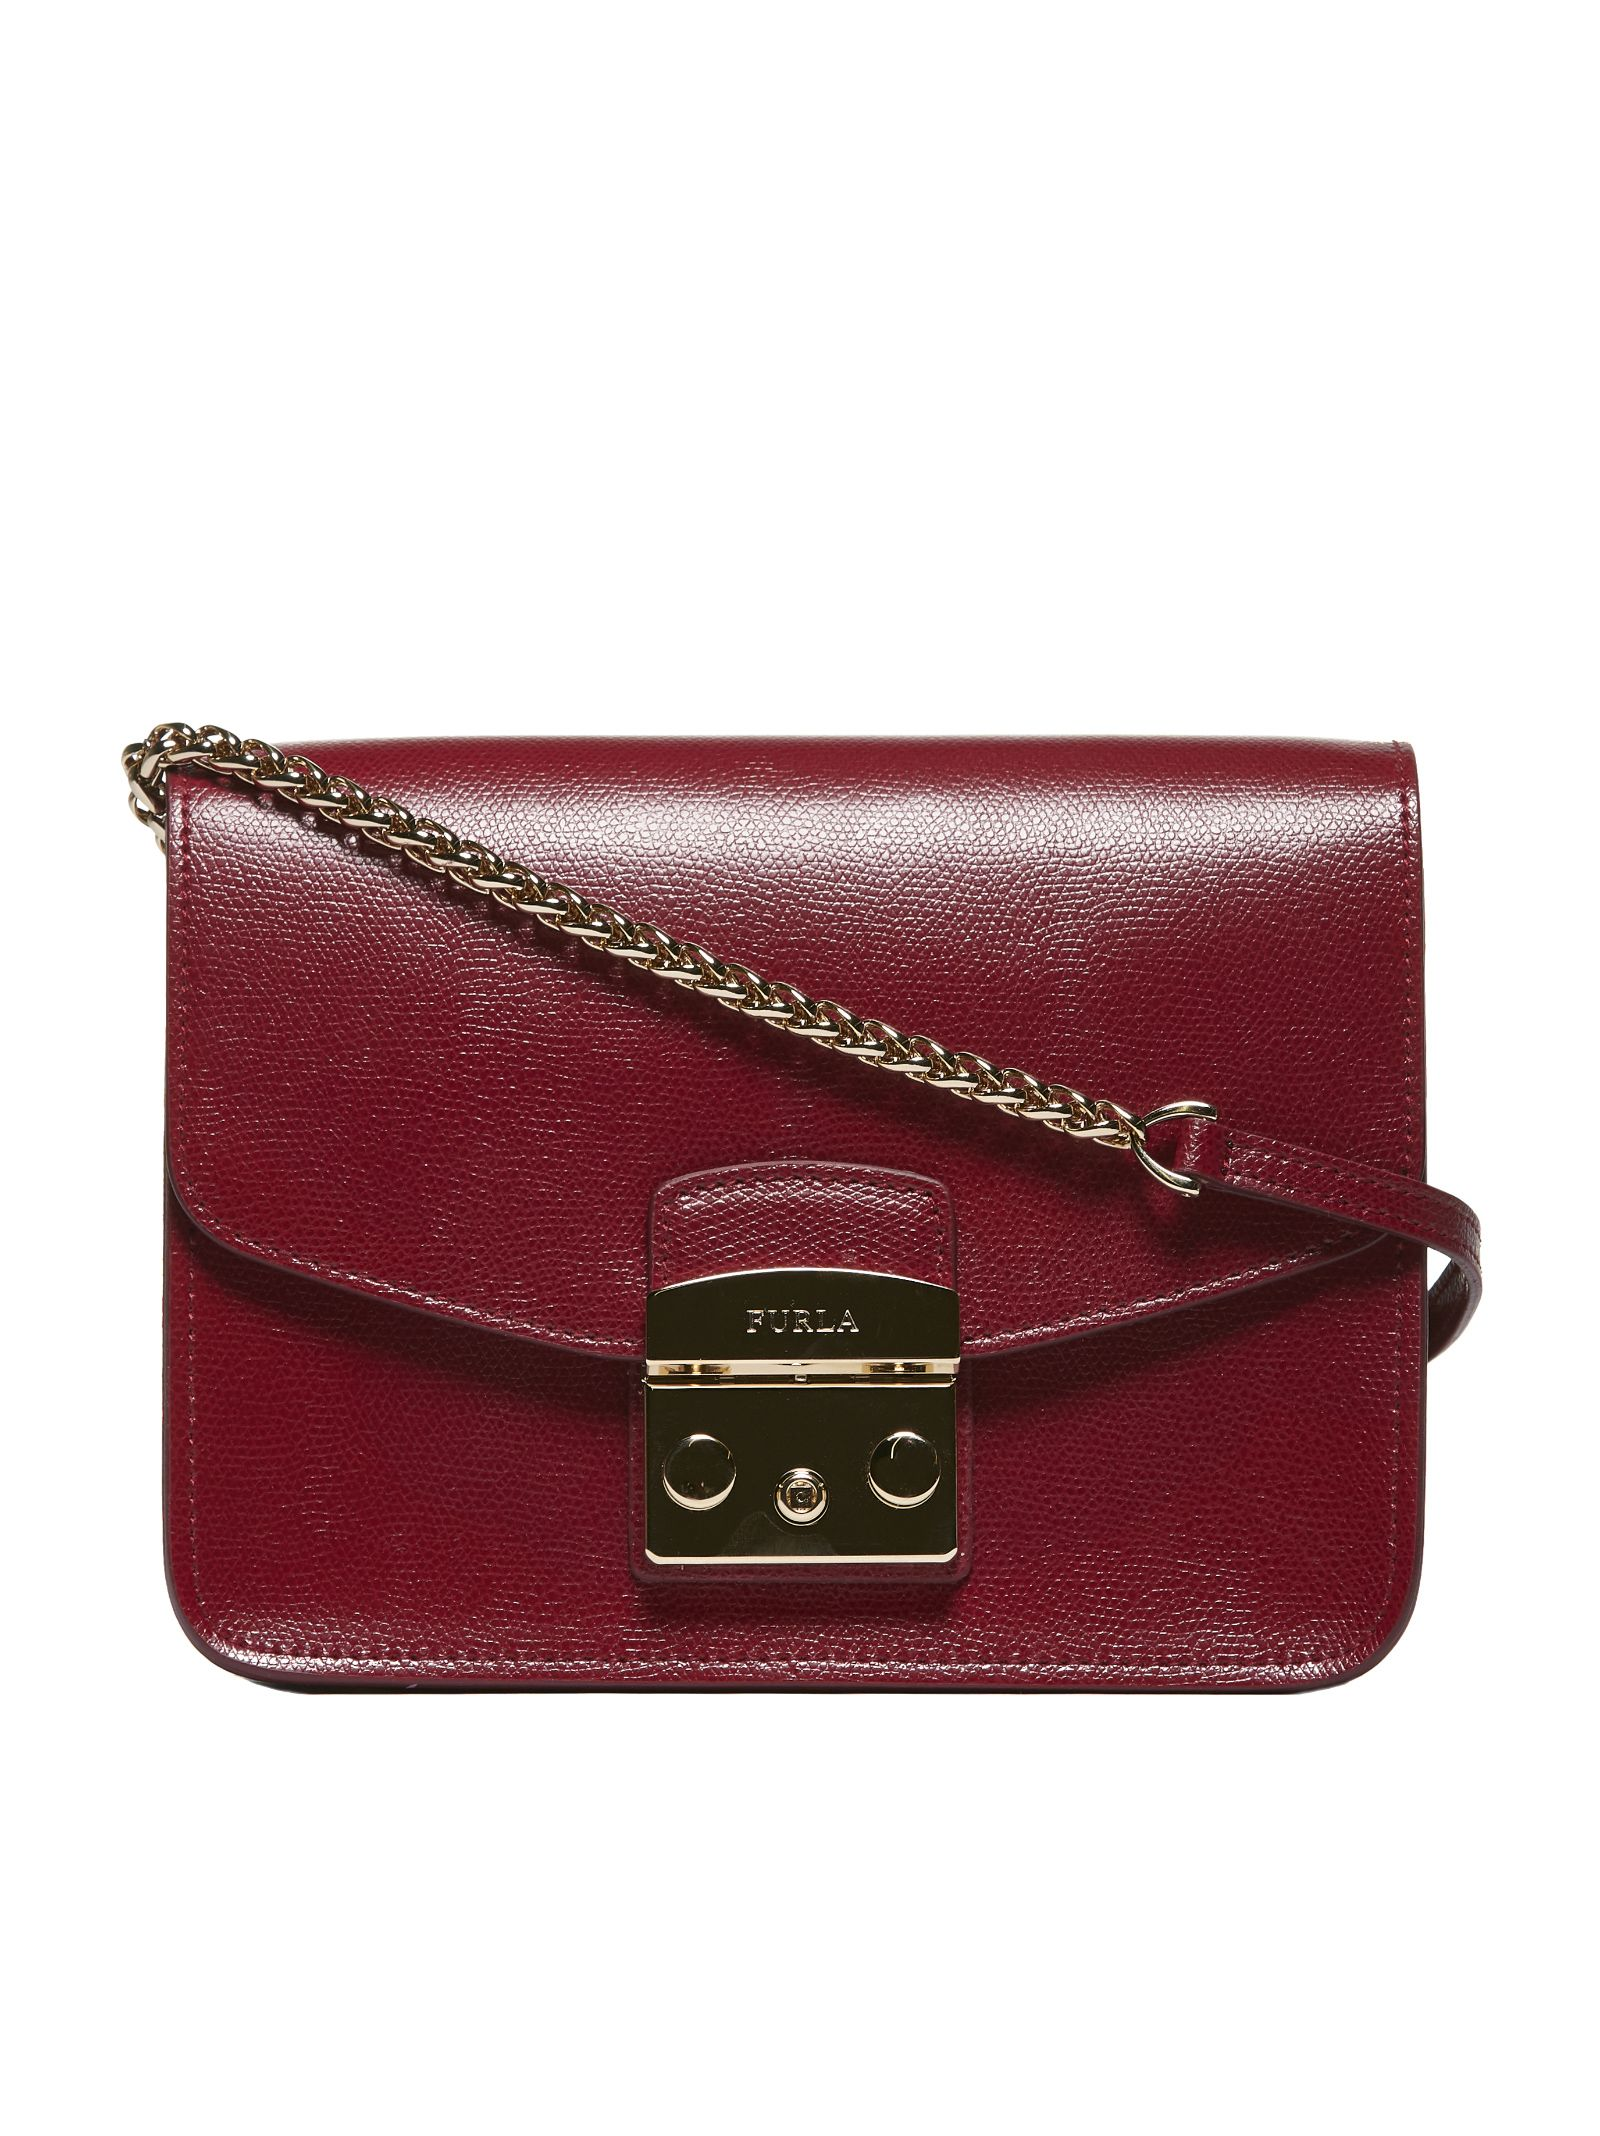 Italist Best Price In The Market For Furla Mini Metropolis Shoulder Bag Bordeaux